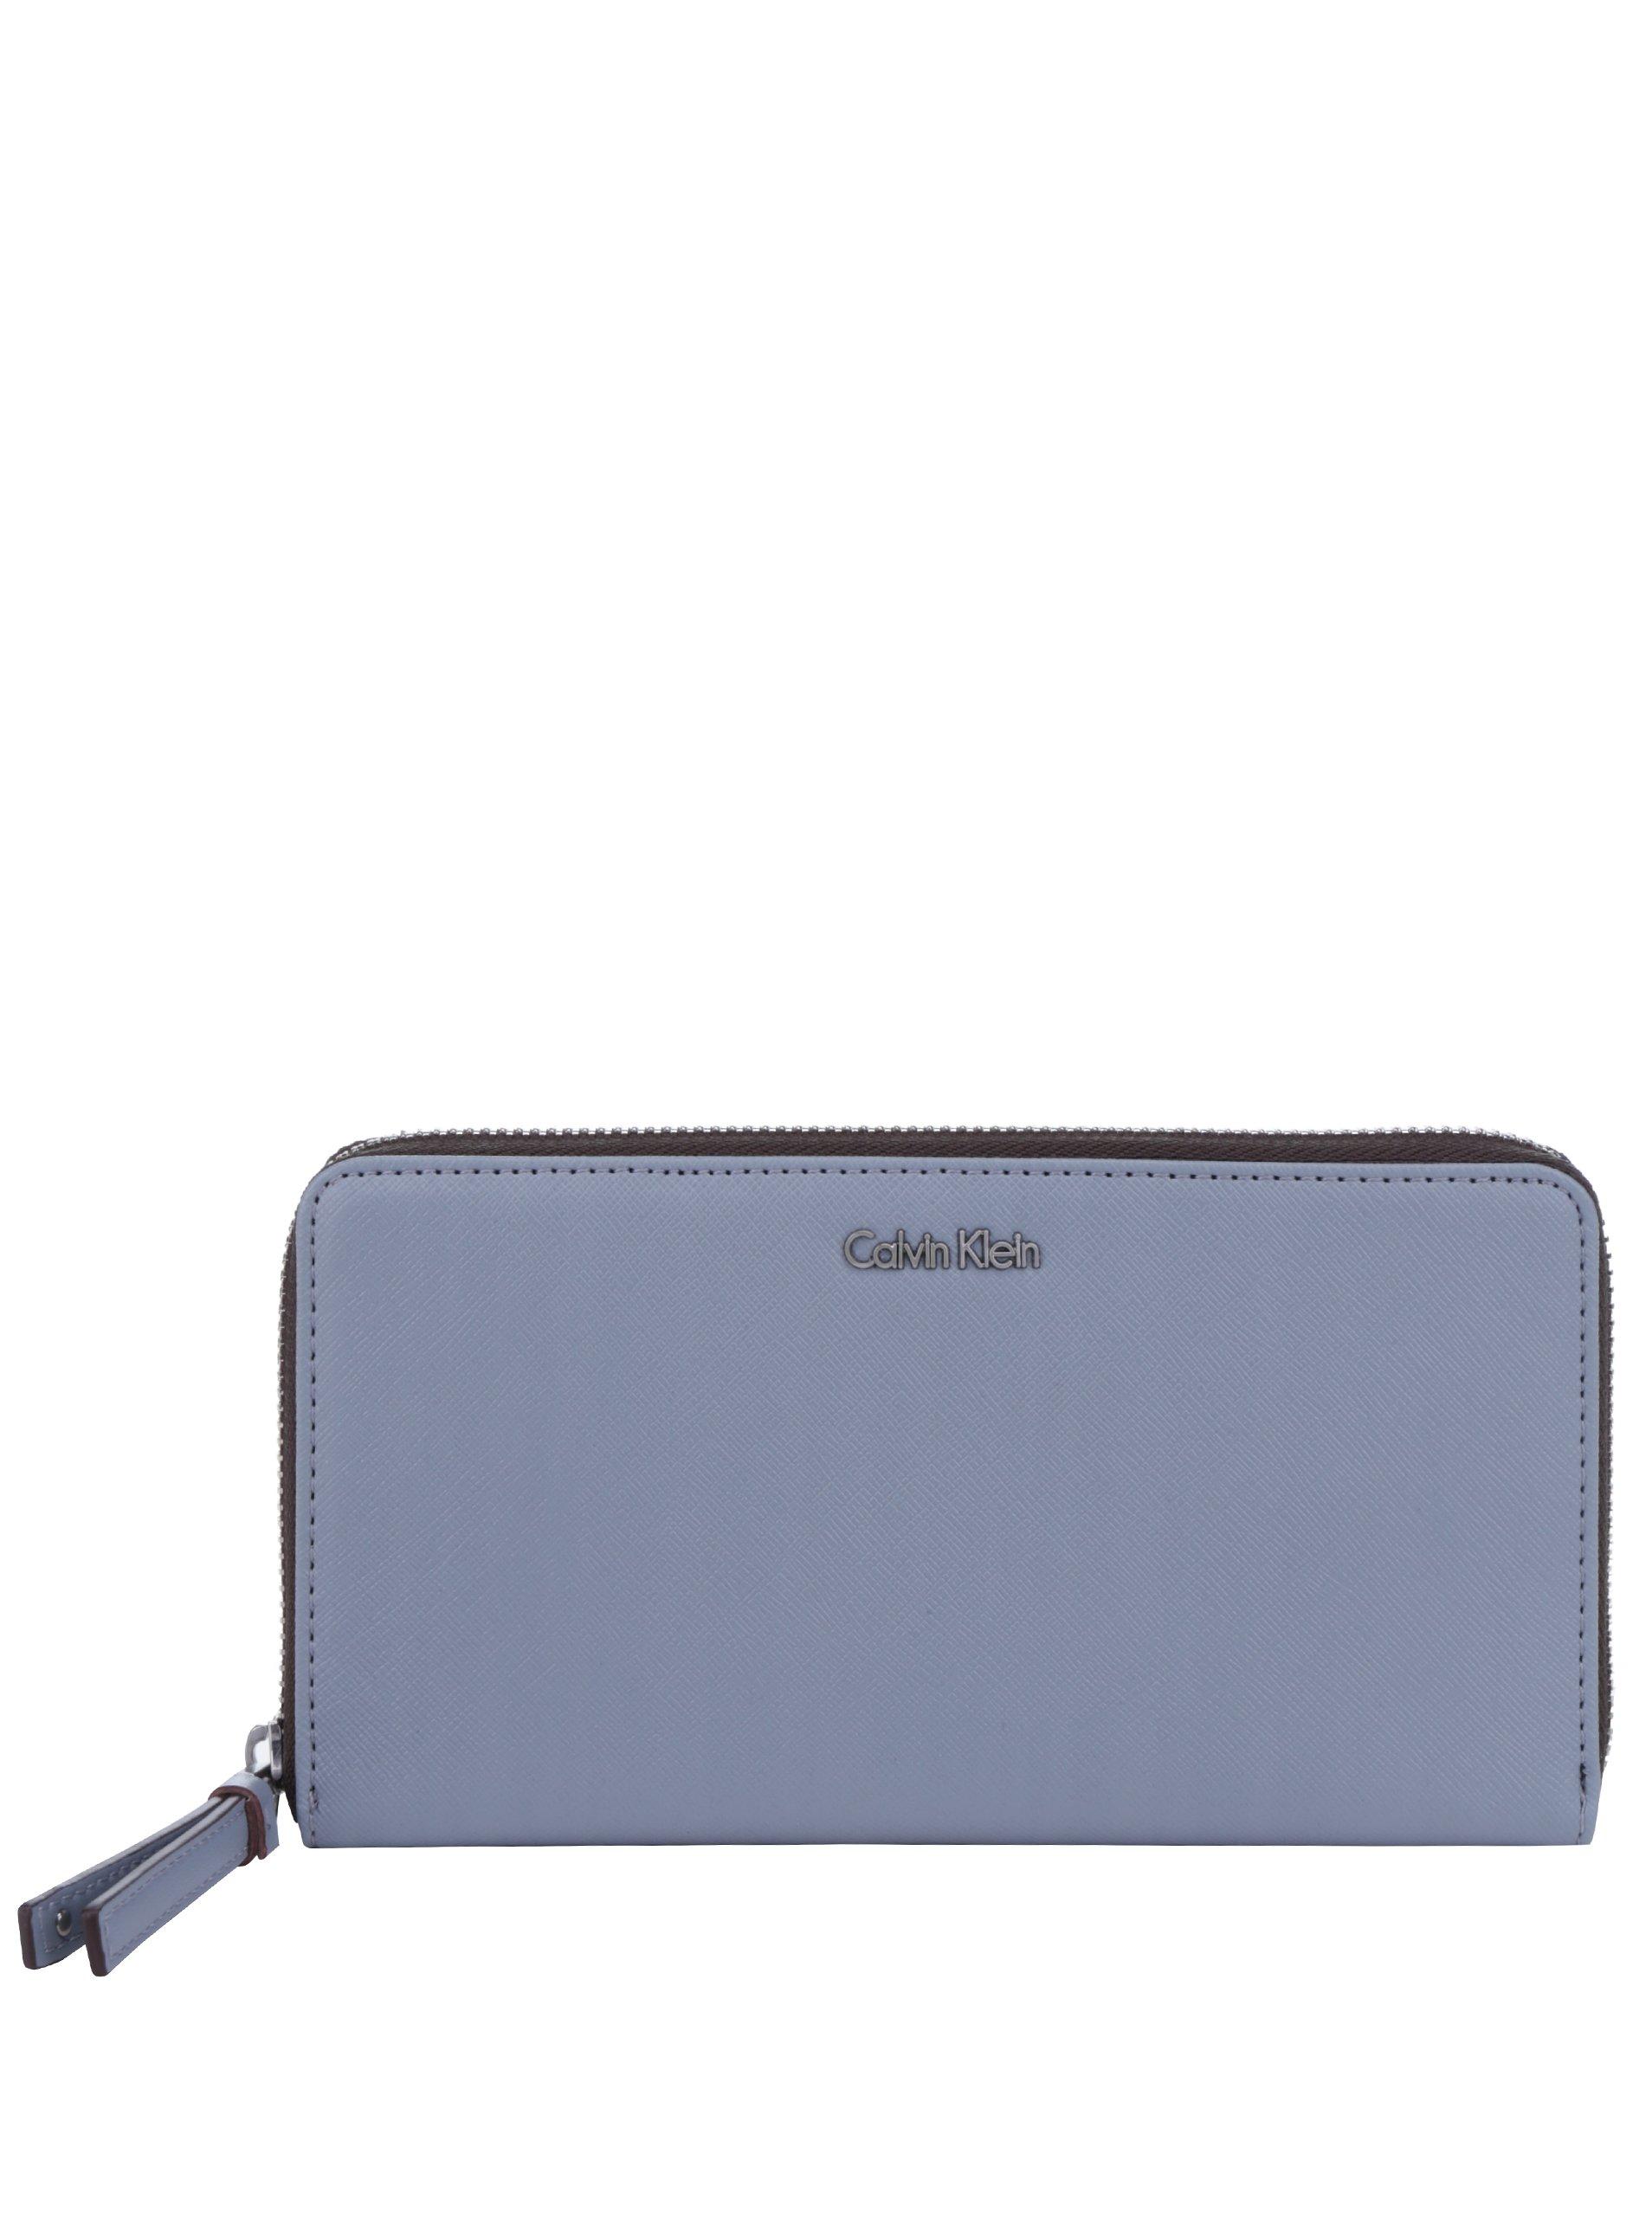 Šedá dámská velká peněženka Calvin Klein Jeans Marissa